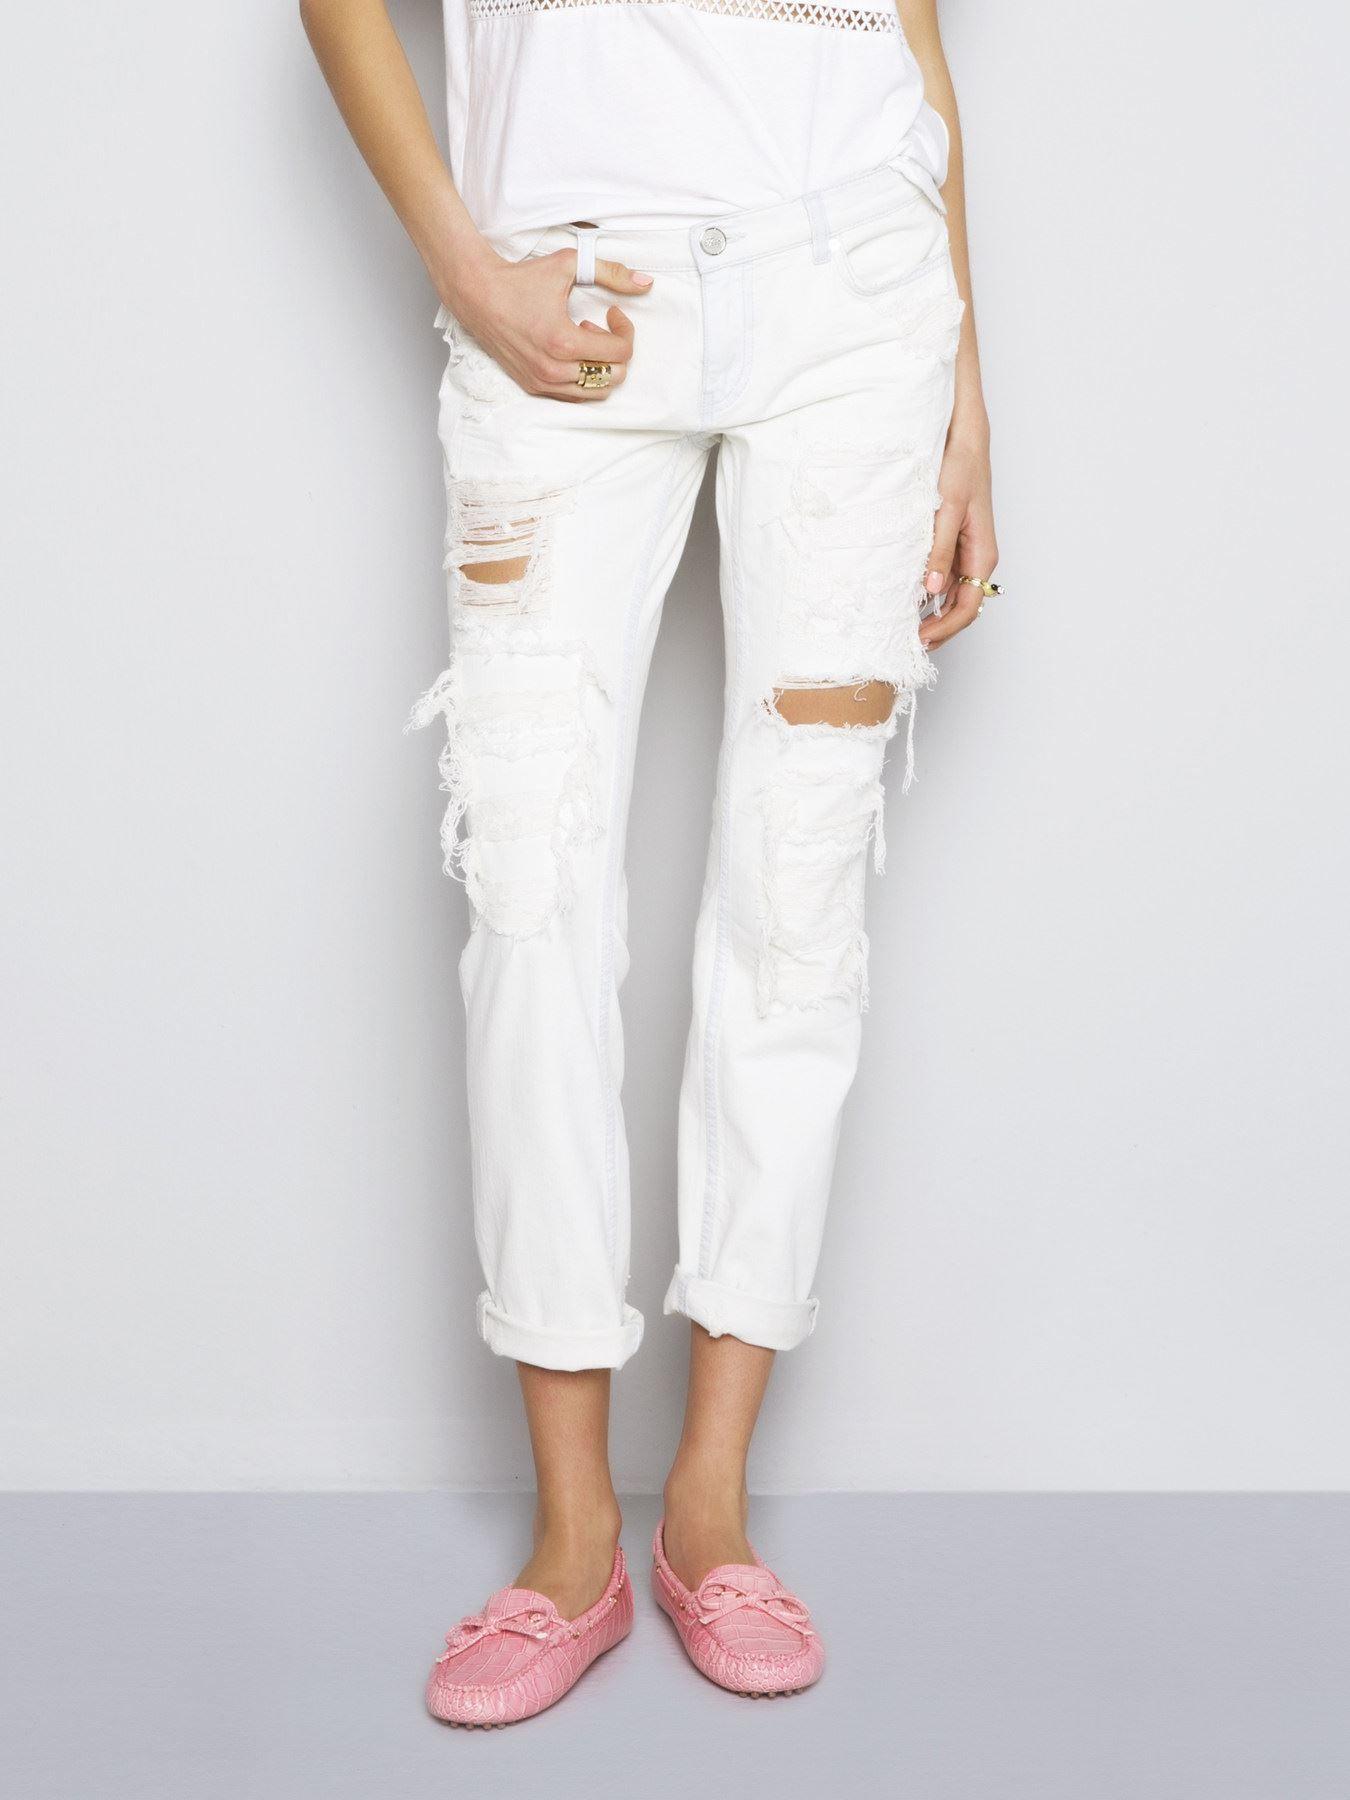 Twist Bol Kesim Yirtik Jean Pantolon 91 00 Tl Moda Stilleri Pantolon Elbise